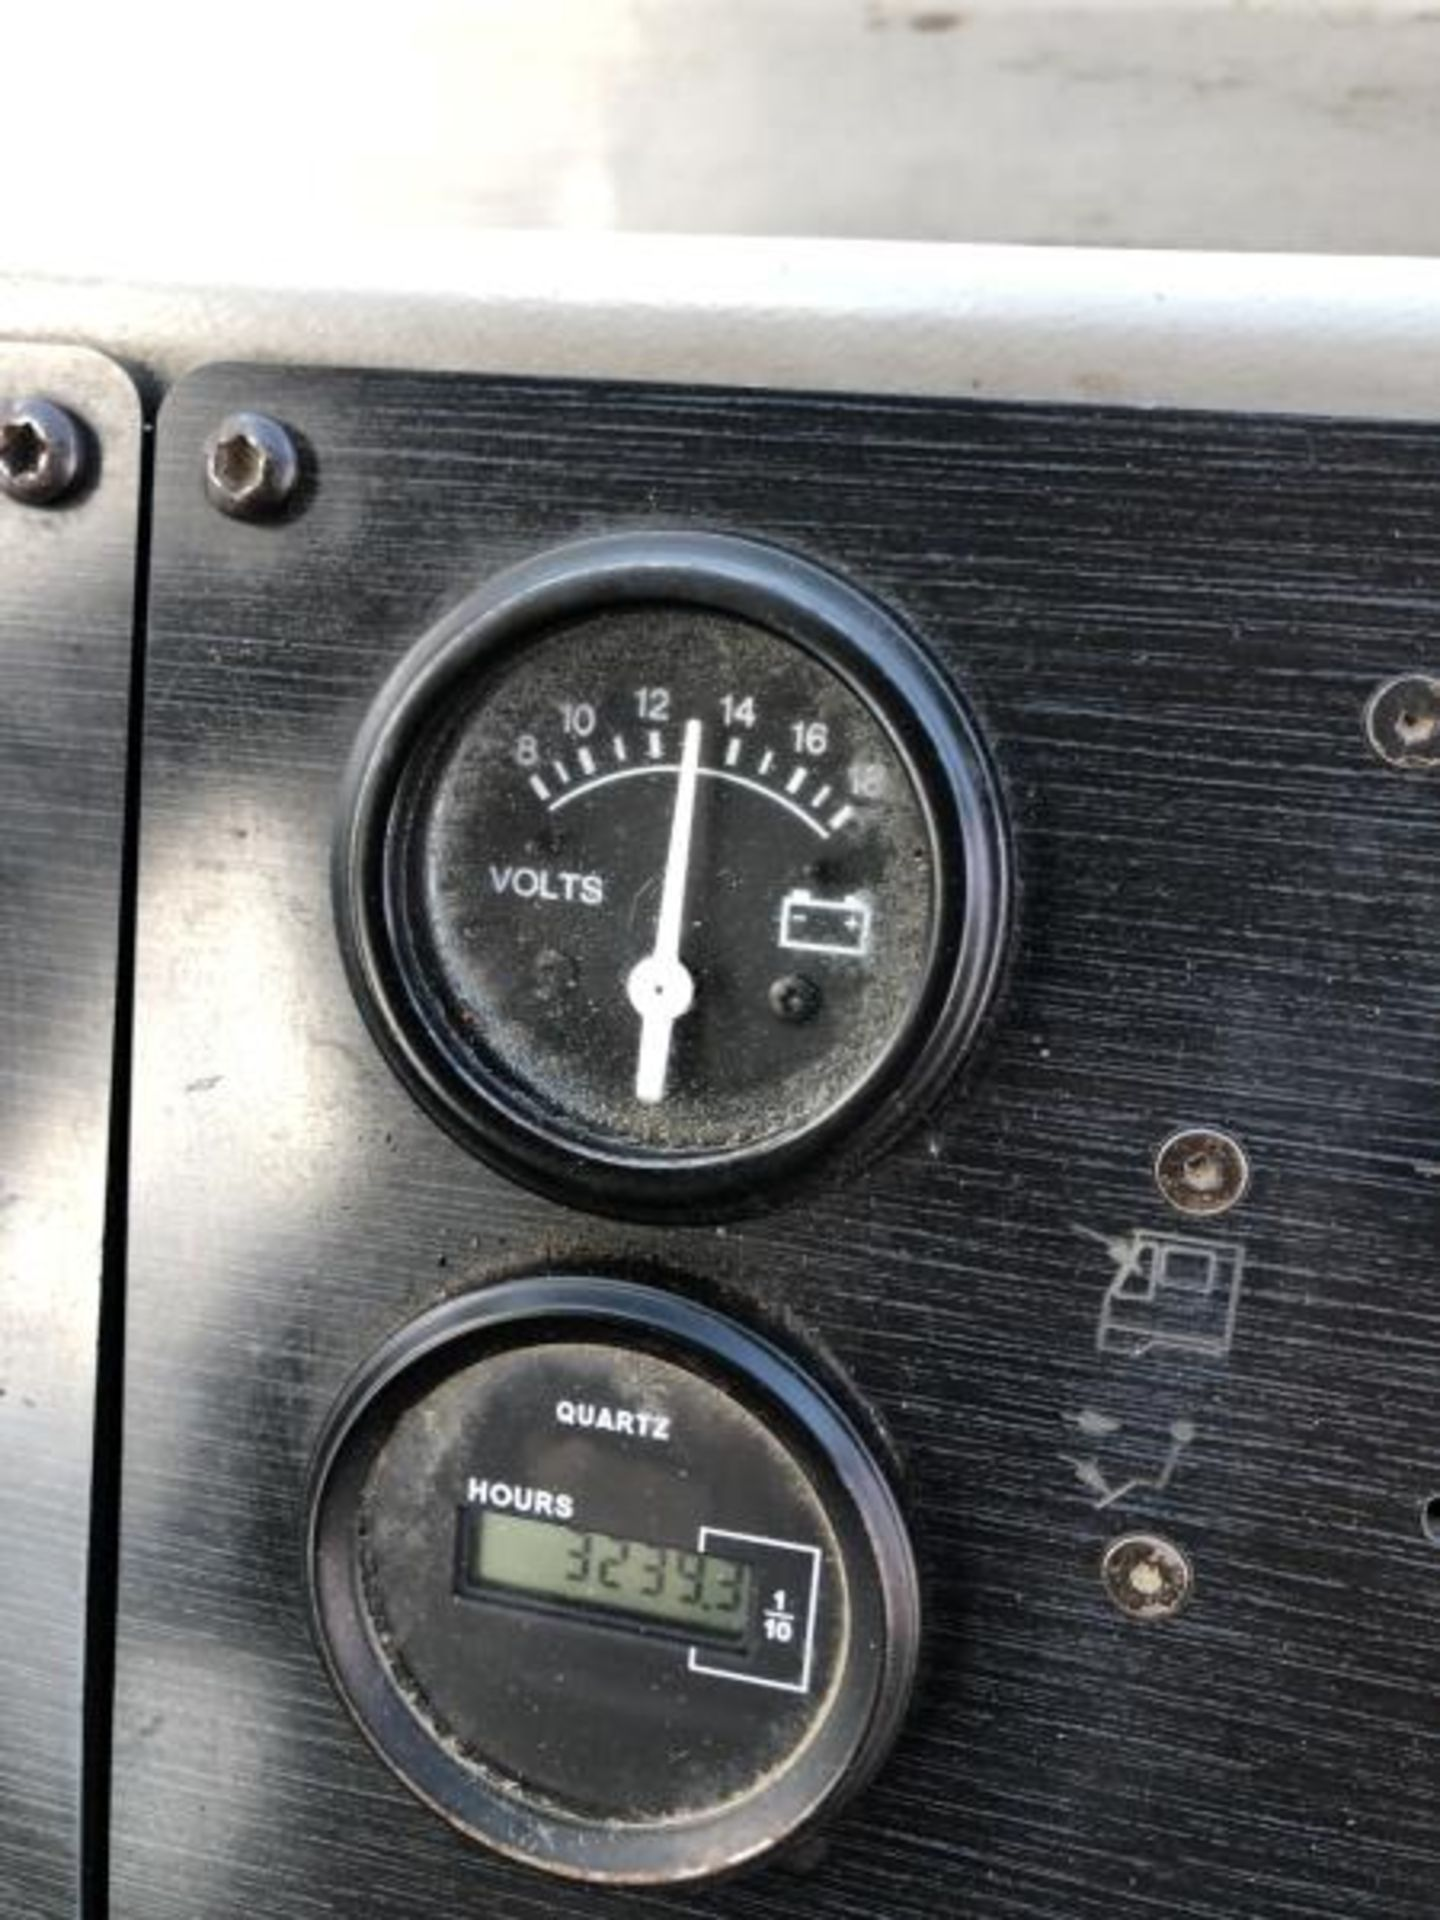 2015 Kalmar Ottawa 4x2 Yard Truck , SN: 338837 3,239.3 Hours, 3,125 Miles - Image 22 of 32